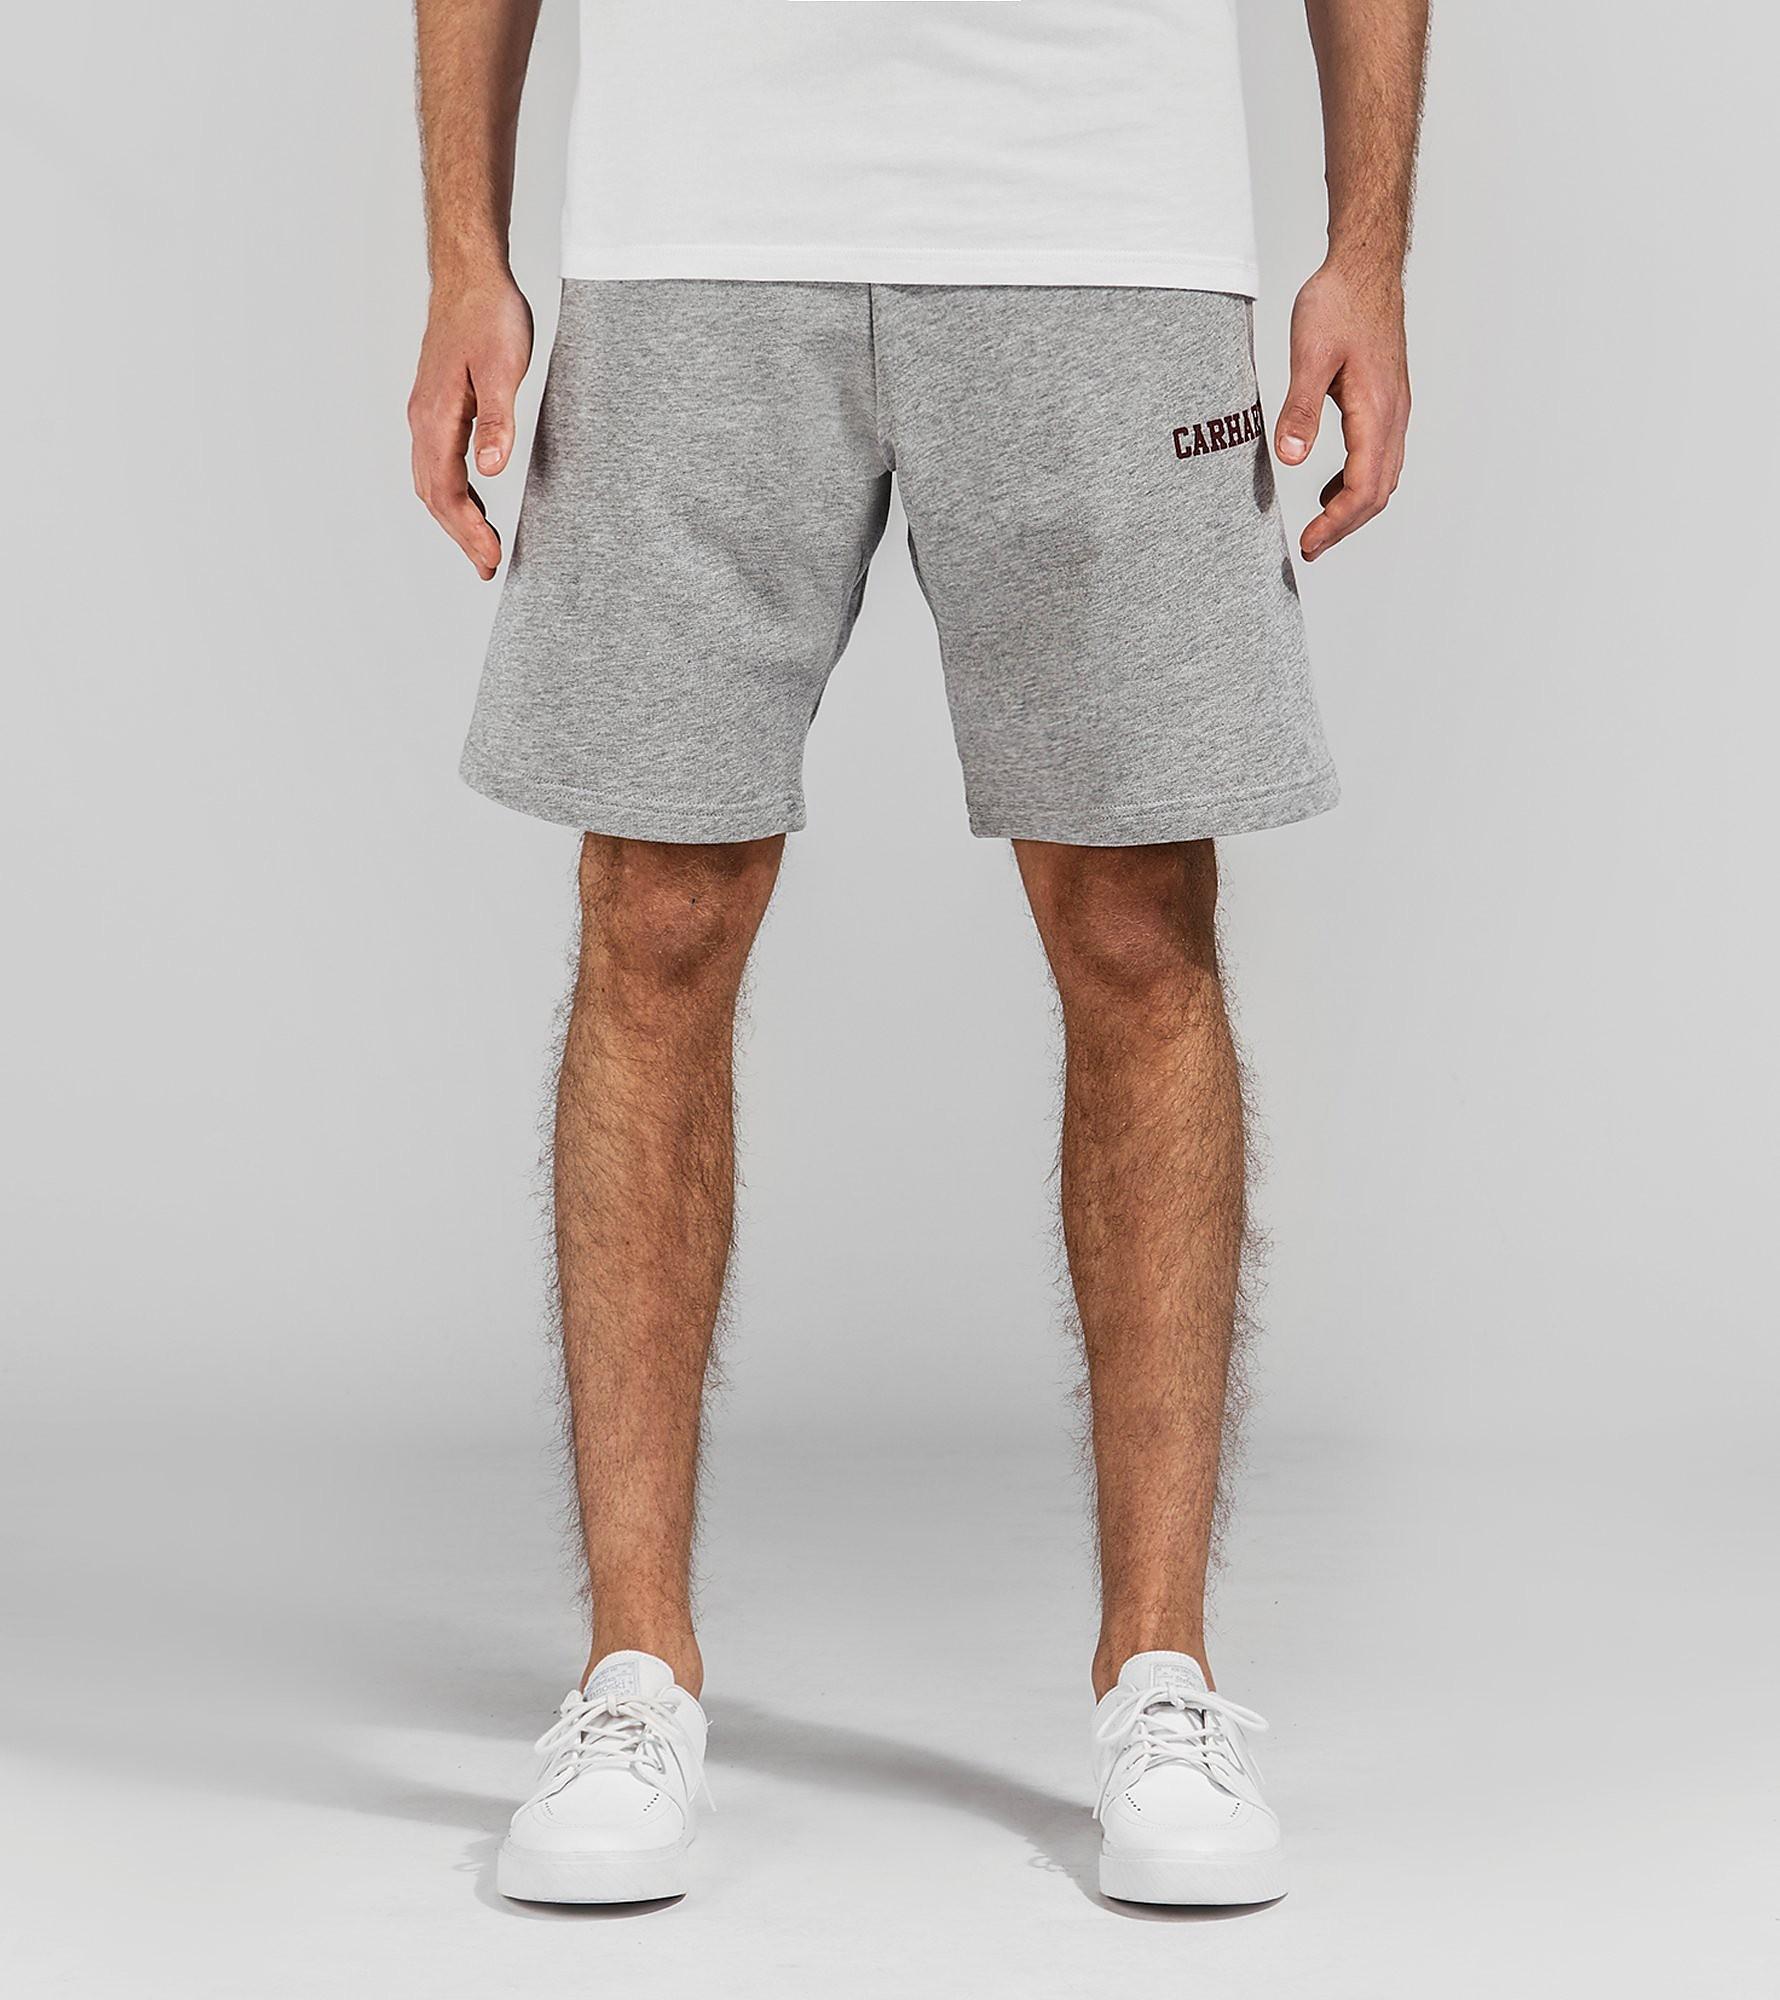 Carhartt WIP College Sweat Shorts